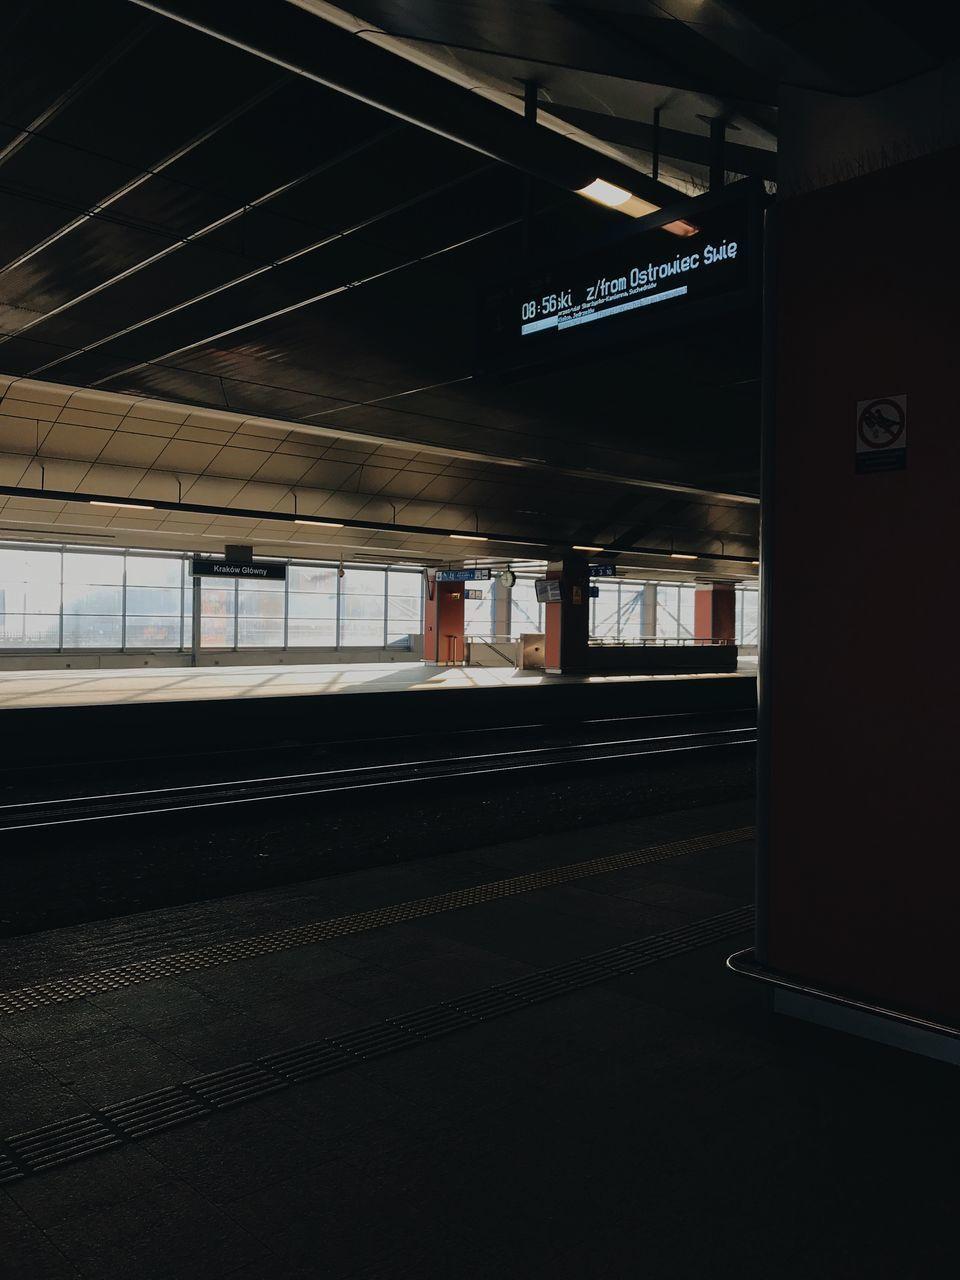 EMPTY RAILROAD STATION PLATFORM